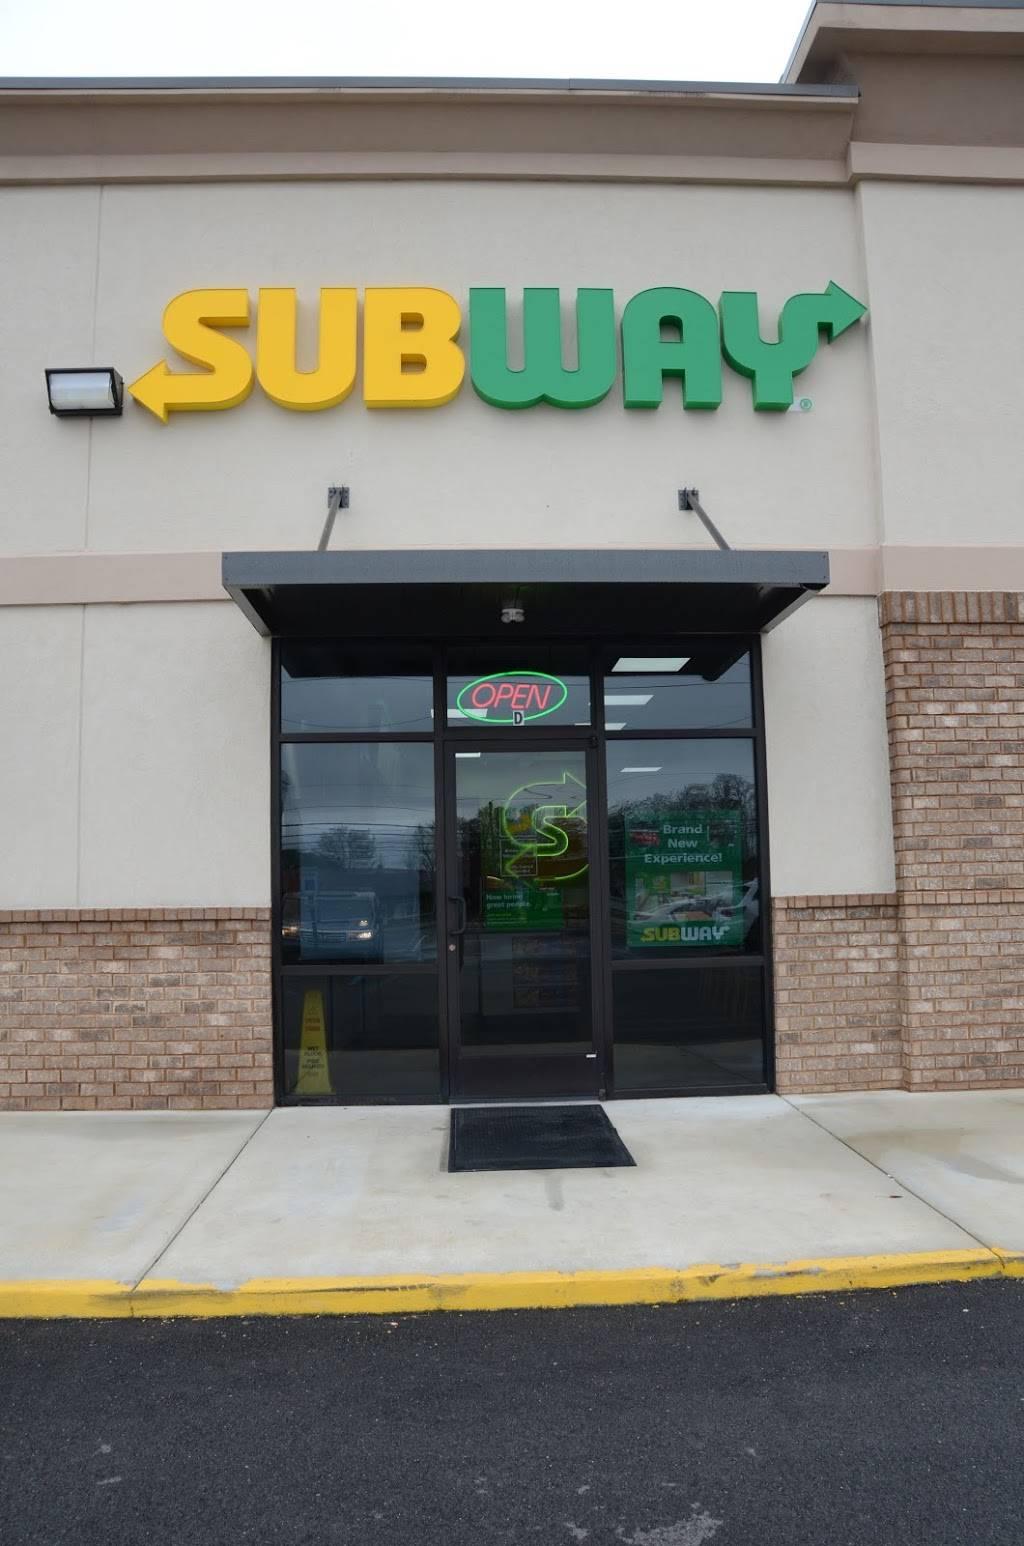 Subway | restaurant | 11805 US 231/431, unit d, Meridianville, AL 35759, USA | 2568282611 OR +1 256-828-2611